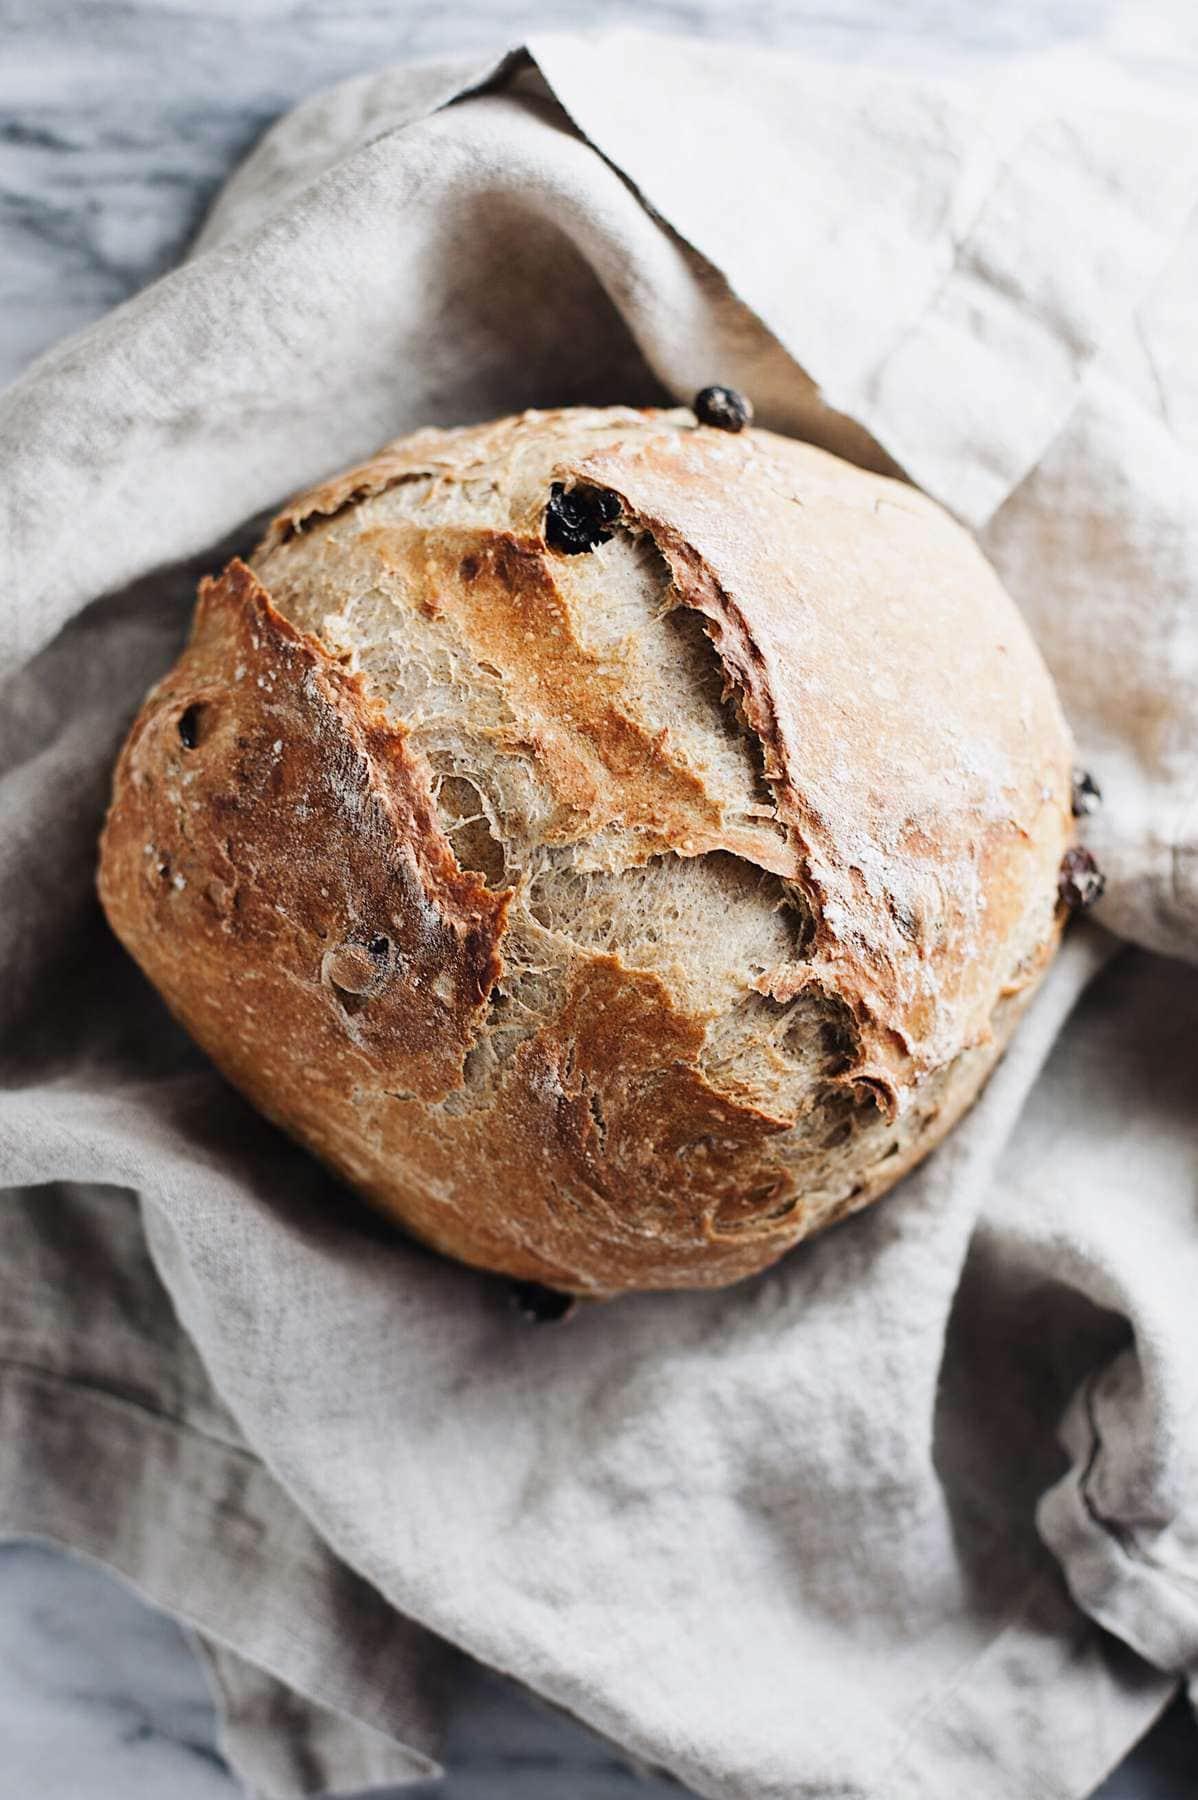 Cinnamon Raisin Artisan Bread | Thanksgiving recipes via entertaining blog @cydconverse